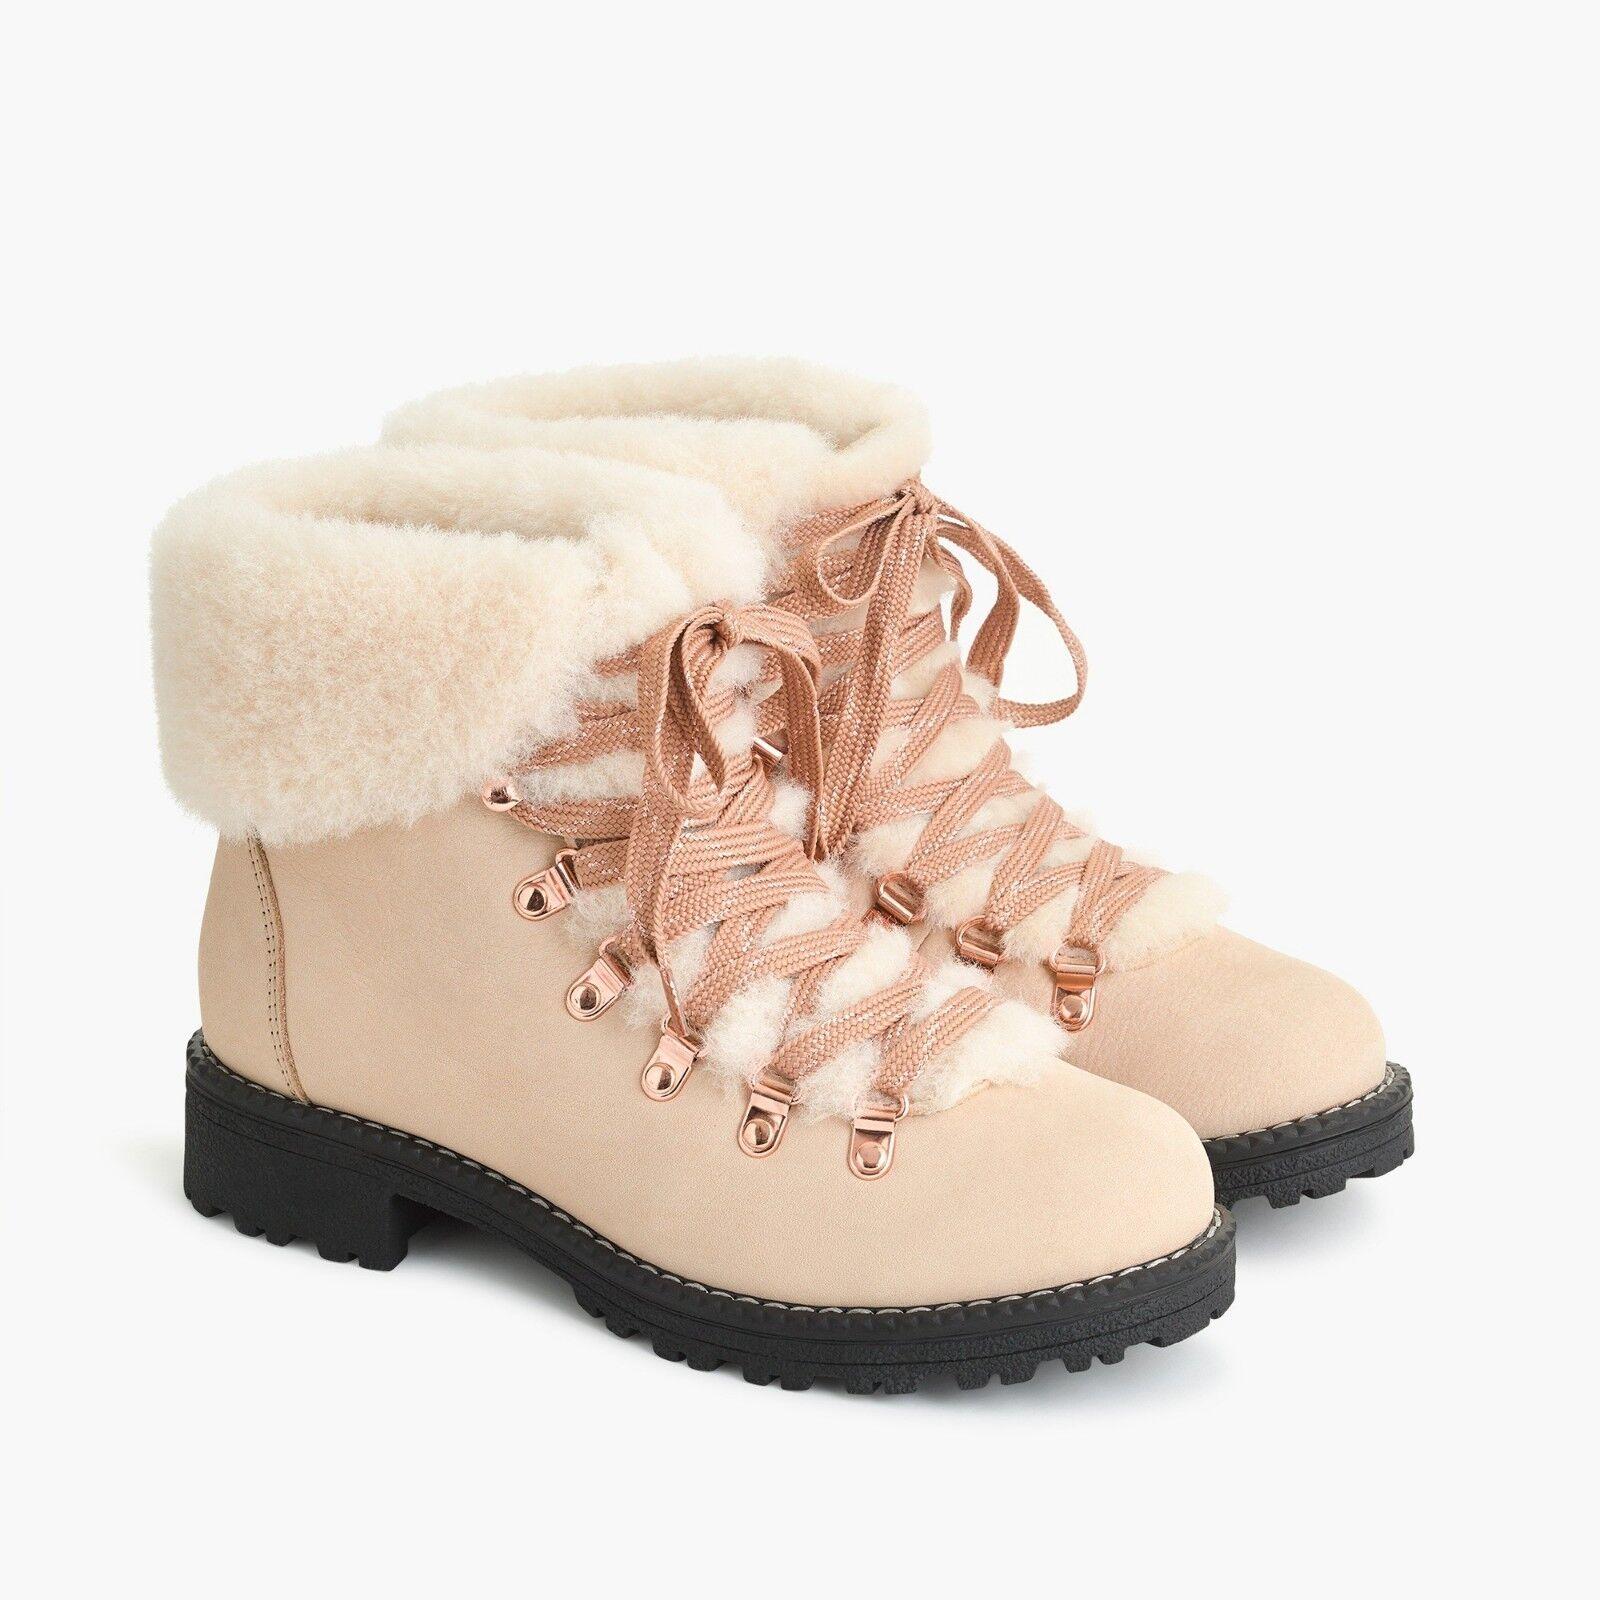 NIB J.CREW  178 Nordic Boots DUNE DUNE DUNE F8444 SZ 9M 9 nubuck leather winter snow e0262e